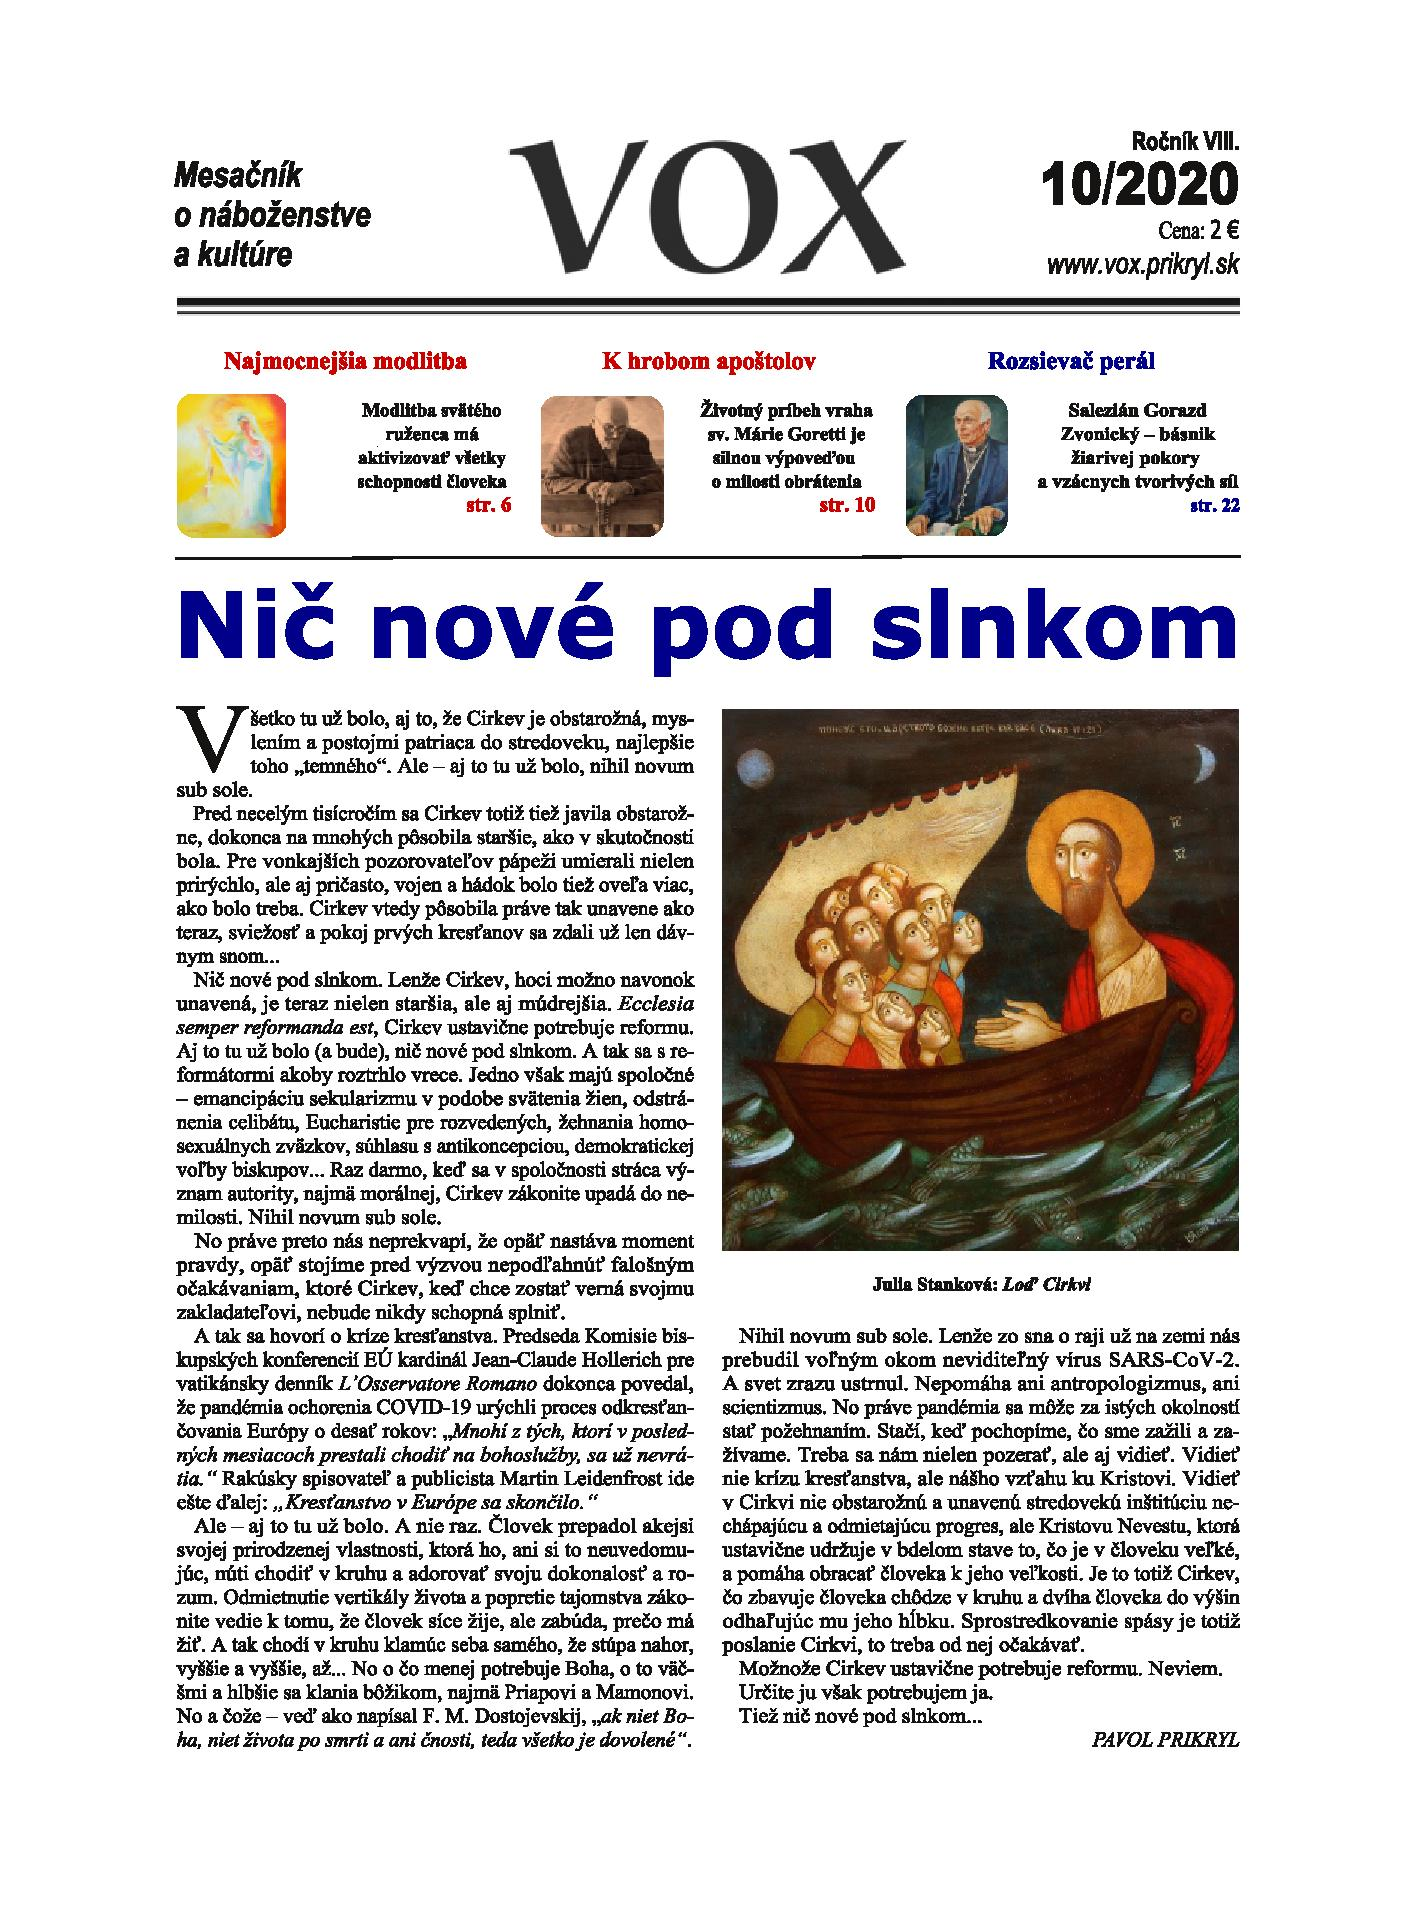 Časopis VOX – odporúčame